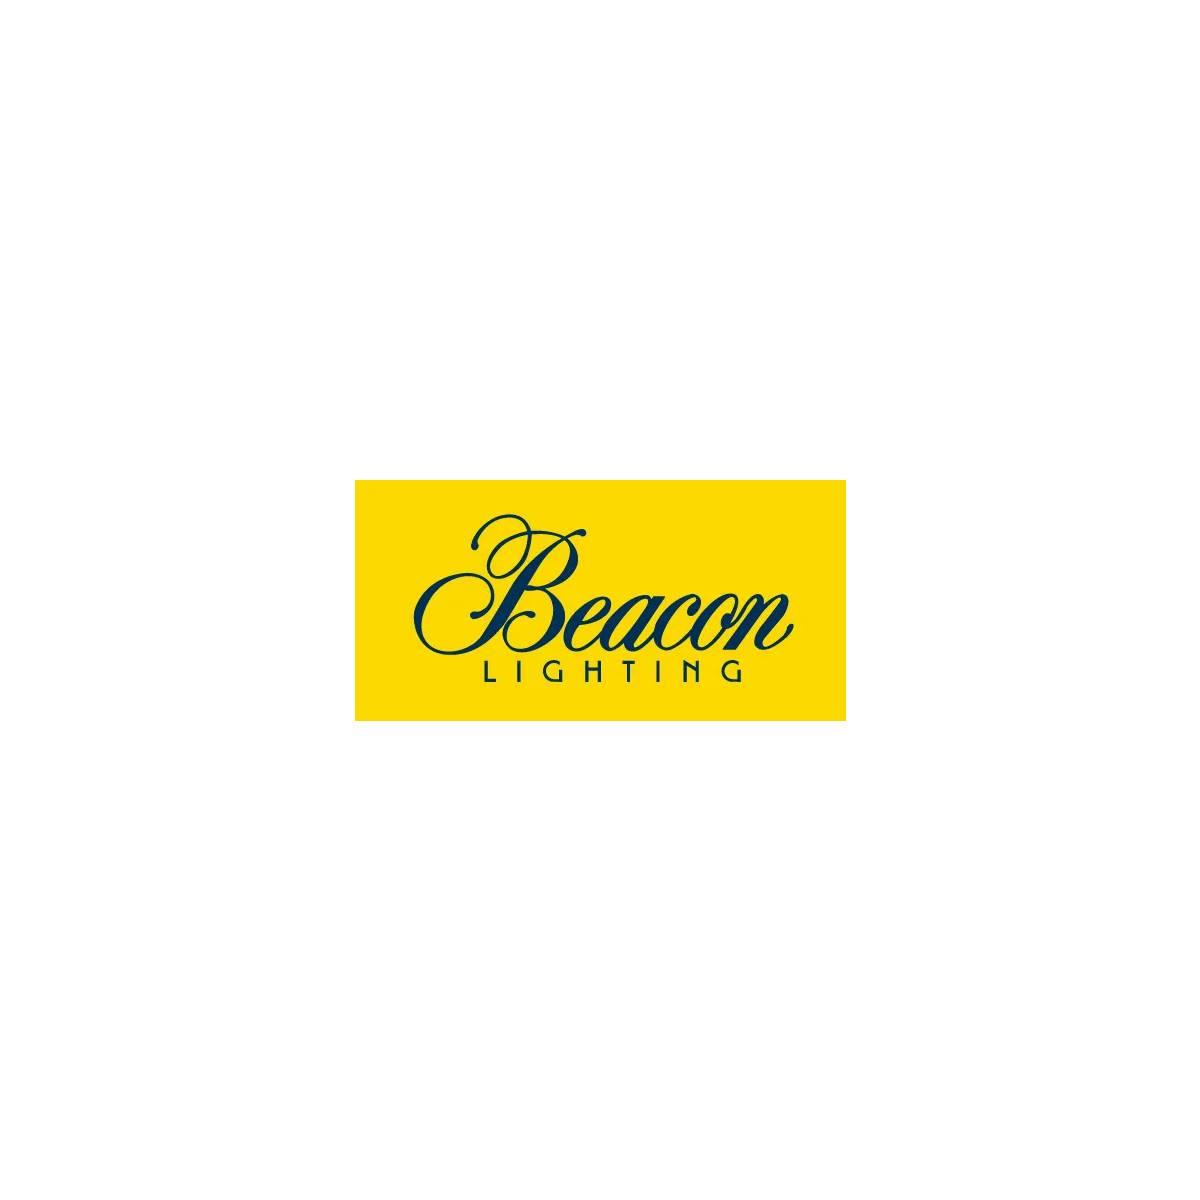 GE LED Bulb Heritage Pilot 7.5 Watt BC DIM Warm White